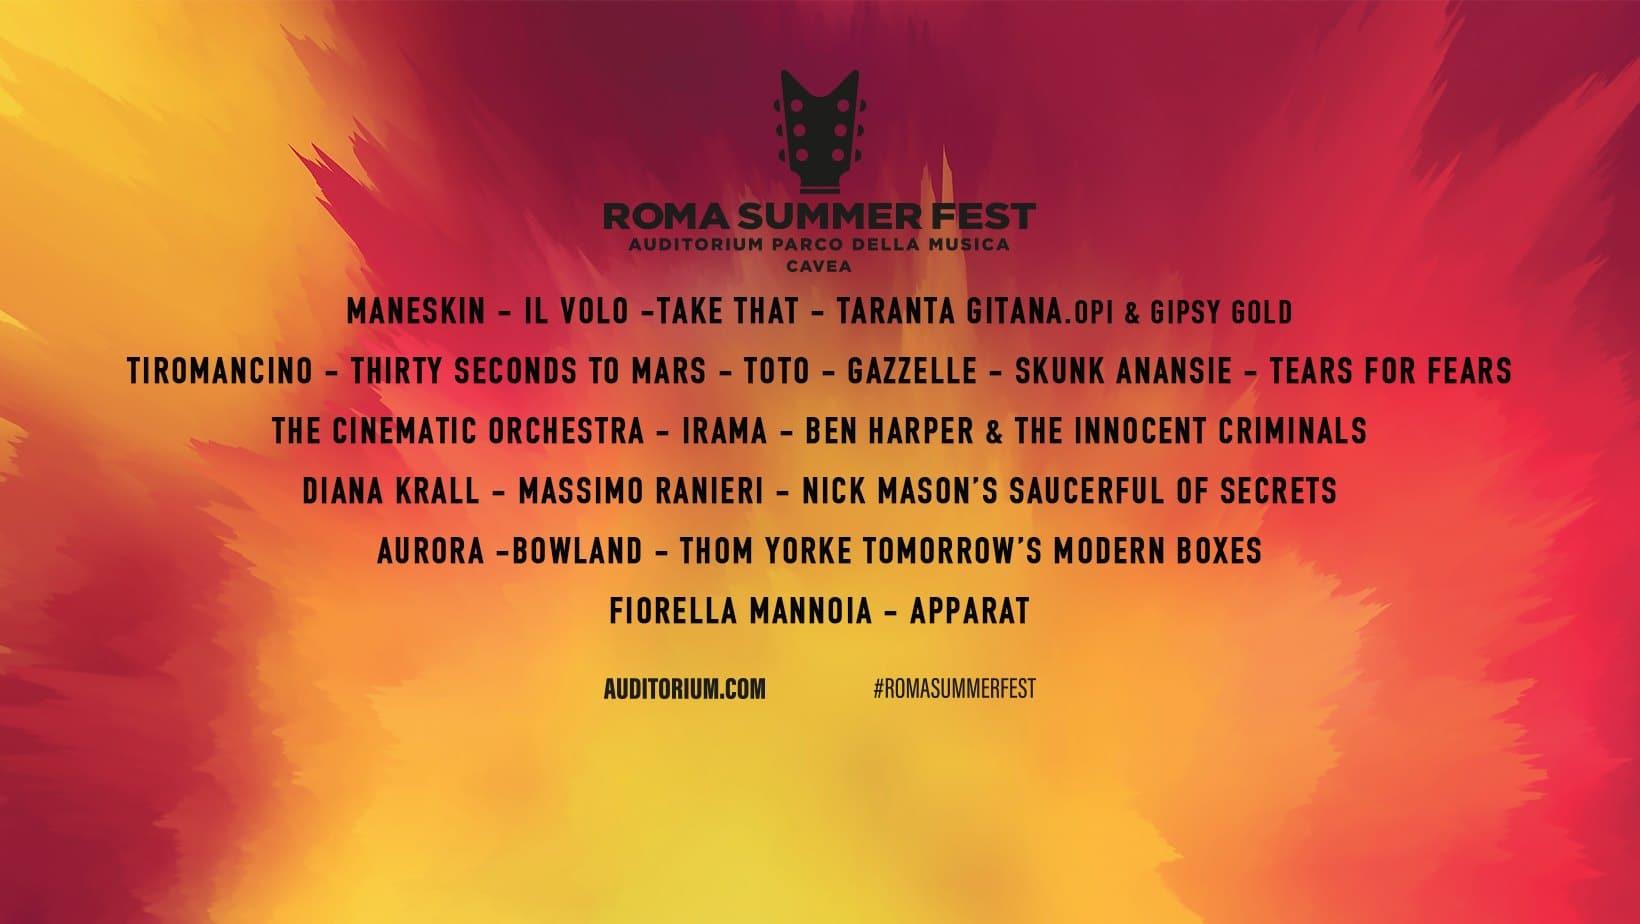 Roma Summer Fest 2019 programma